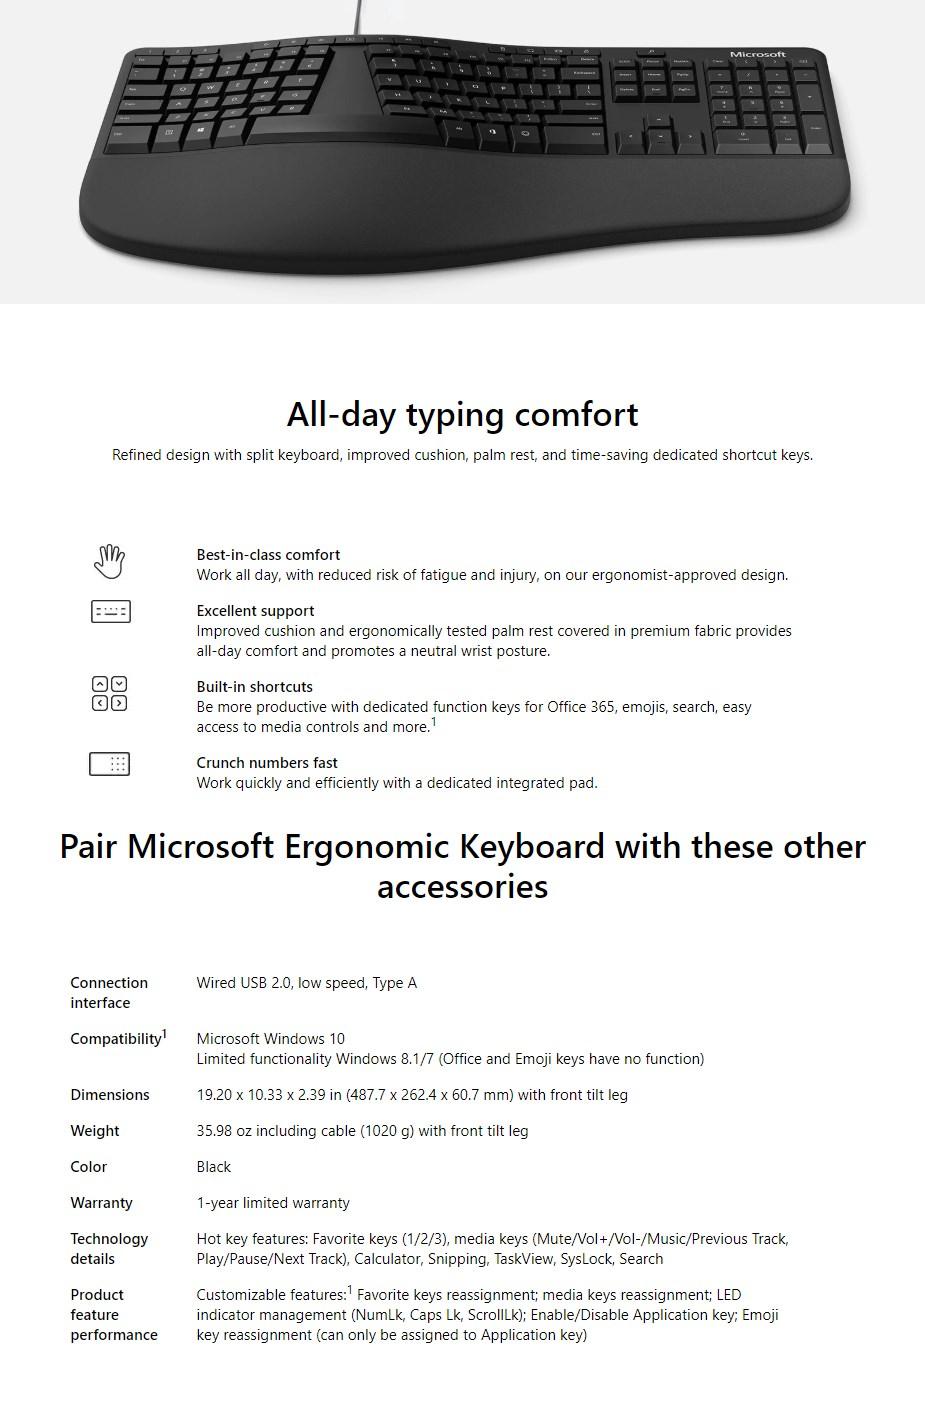 Microsoft Ergonomic Keyboard - Black - Overview 1